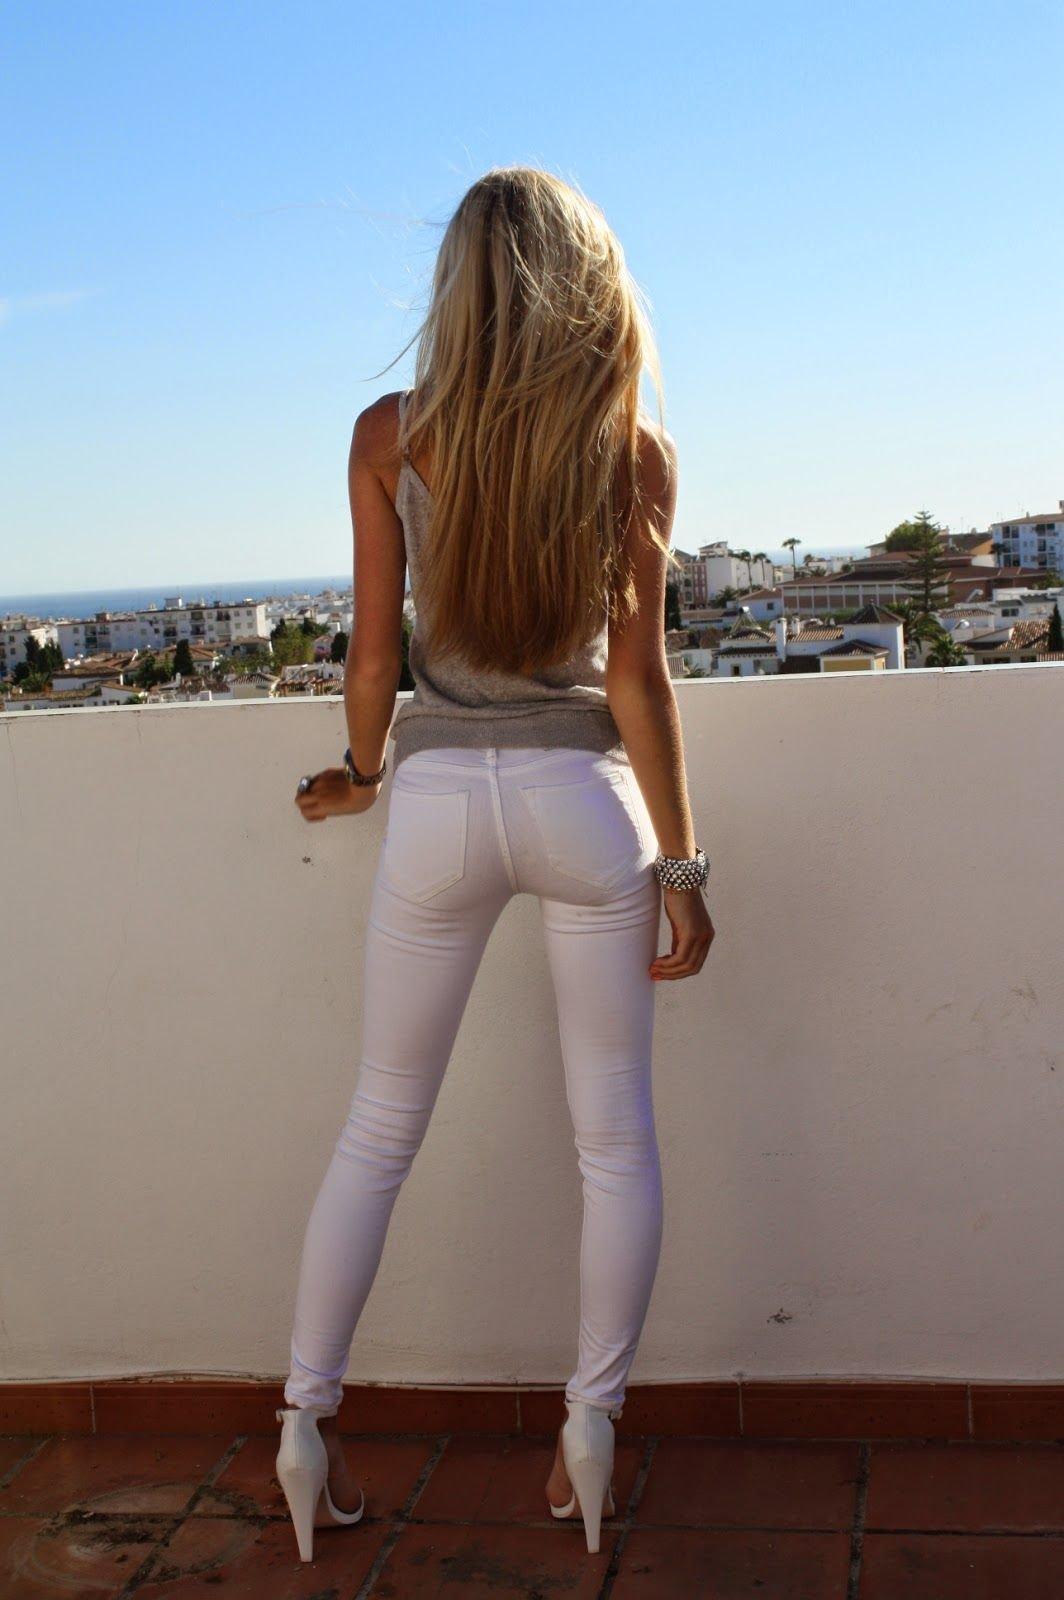 Young girl tight butt nude arab girl